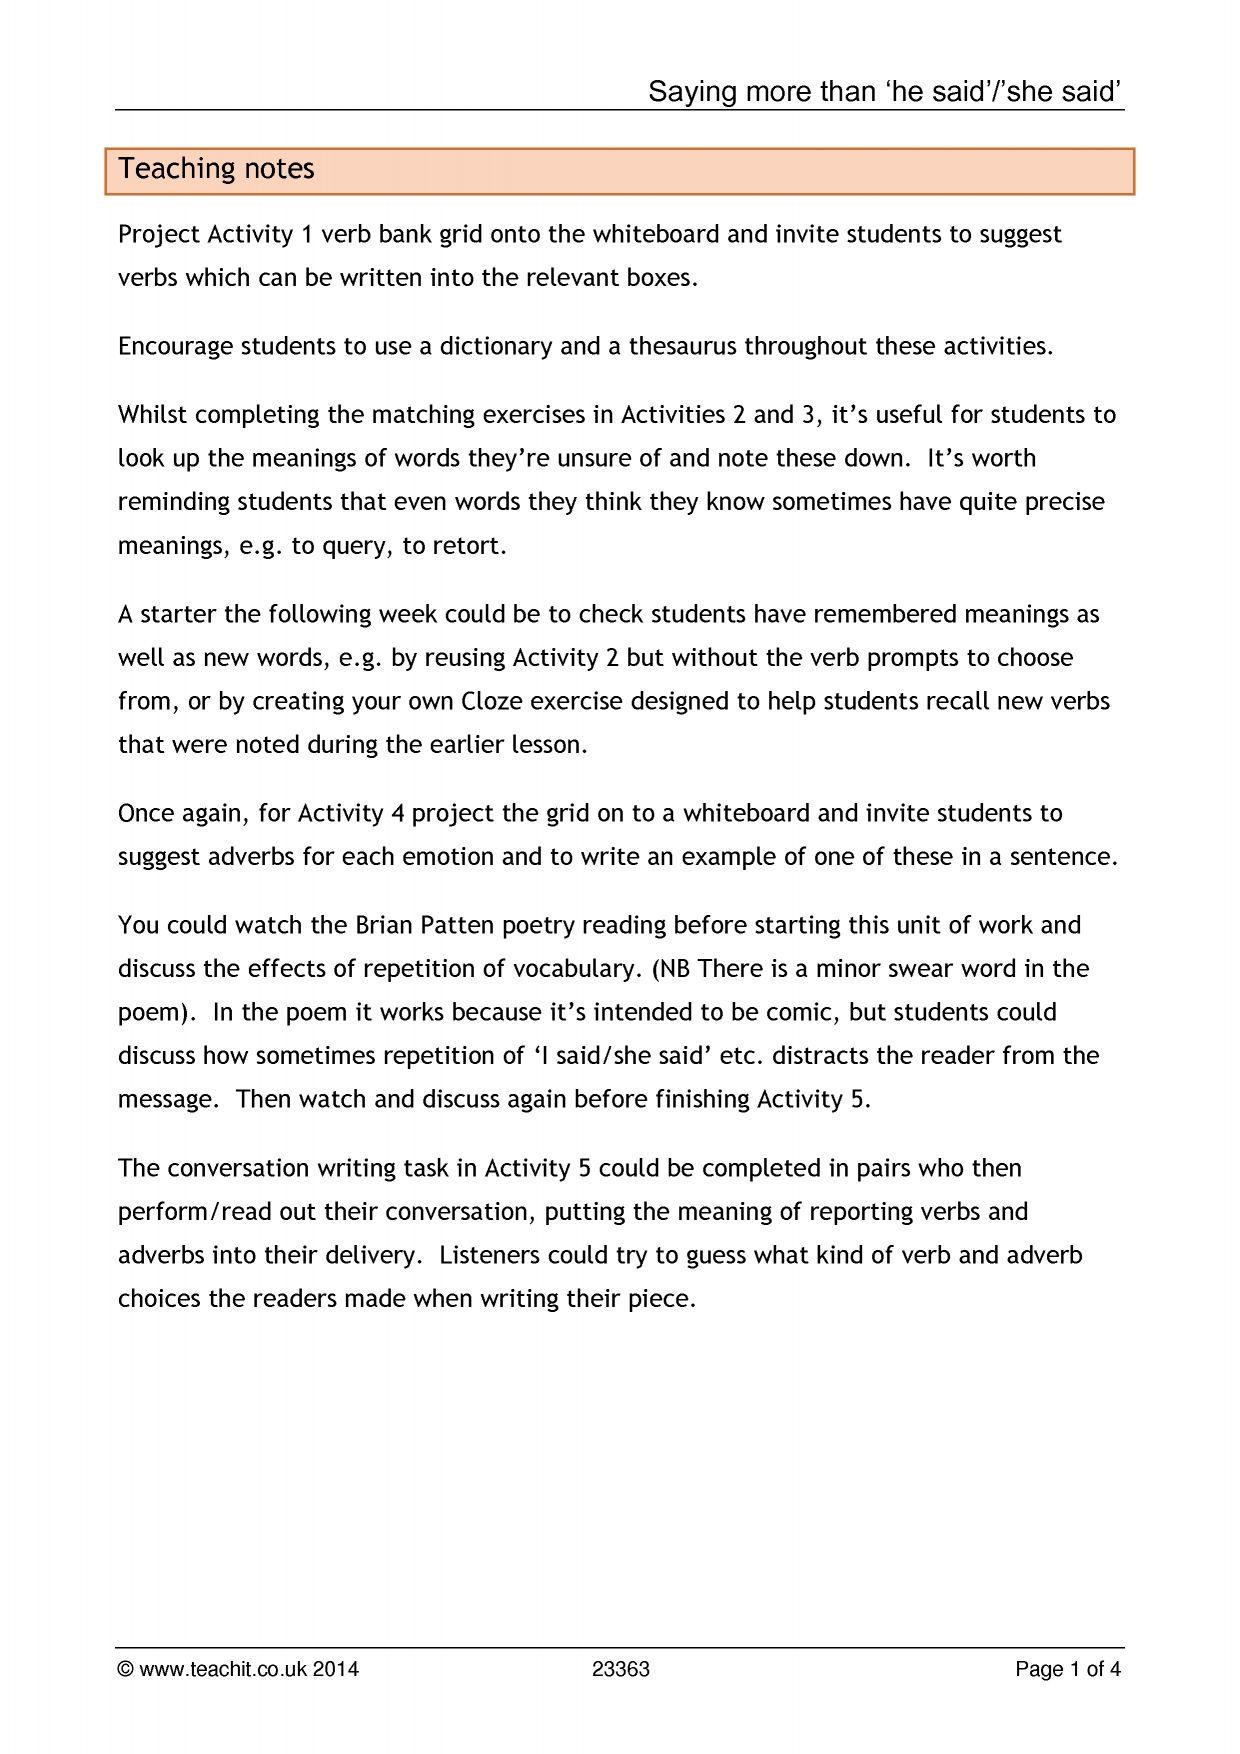 Curriculum Vitae Normalizado Word Modelos de curriculum